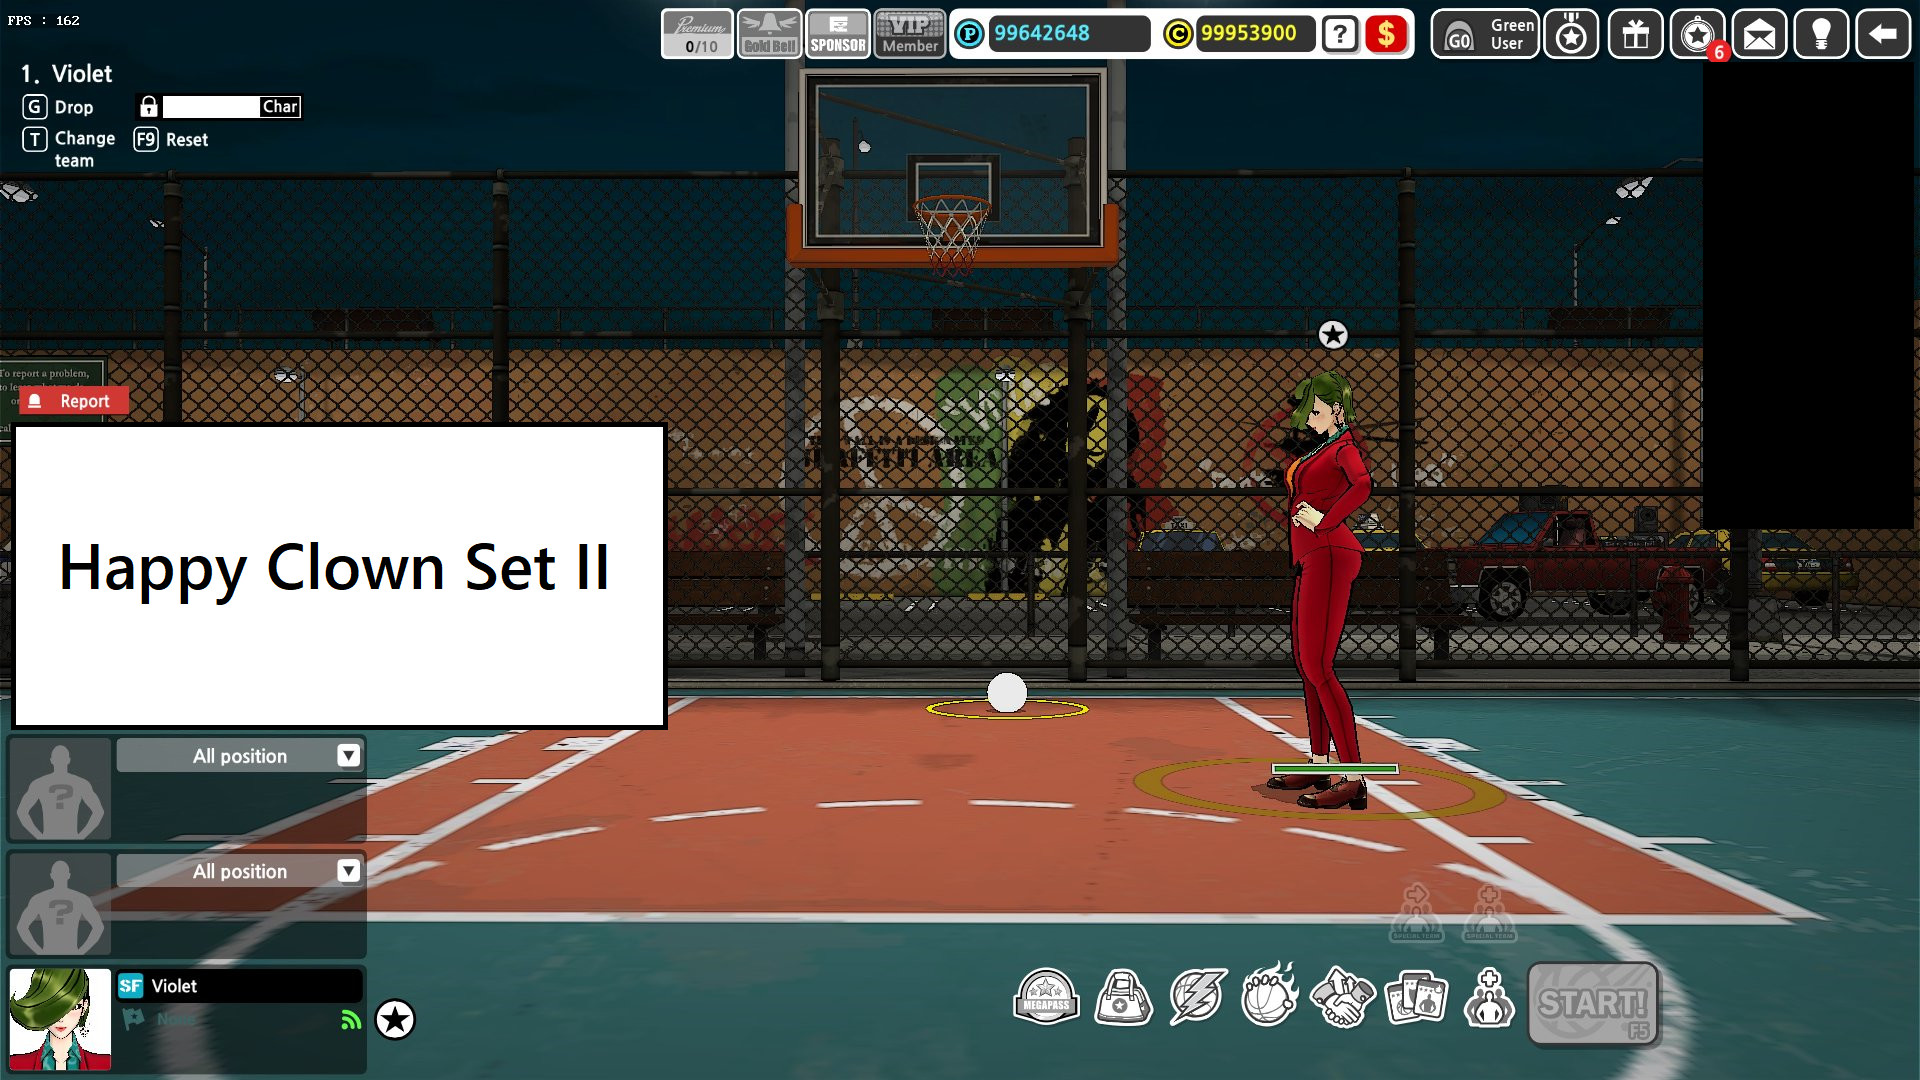 Freestyle2 - Happy Clown Set II screenshot